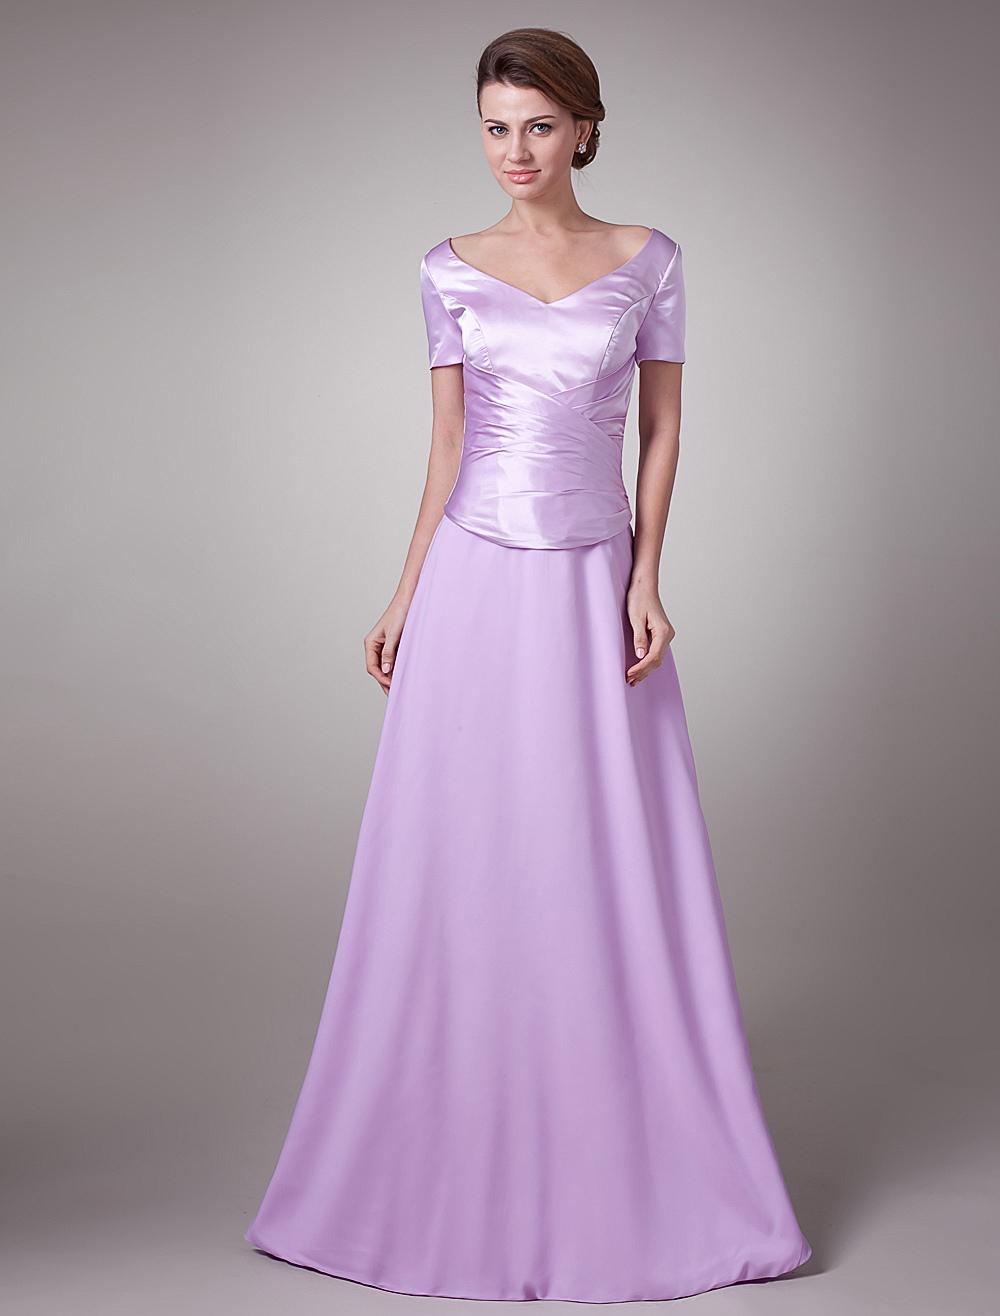 Lavendel Kleid Großhandel Lavendel Kleid Online | Milanoo.com